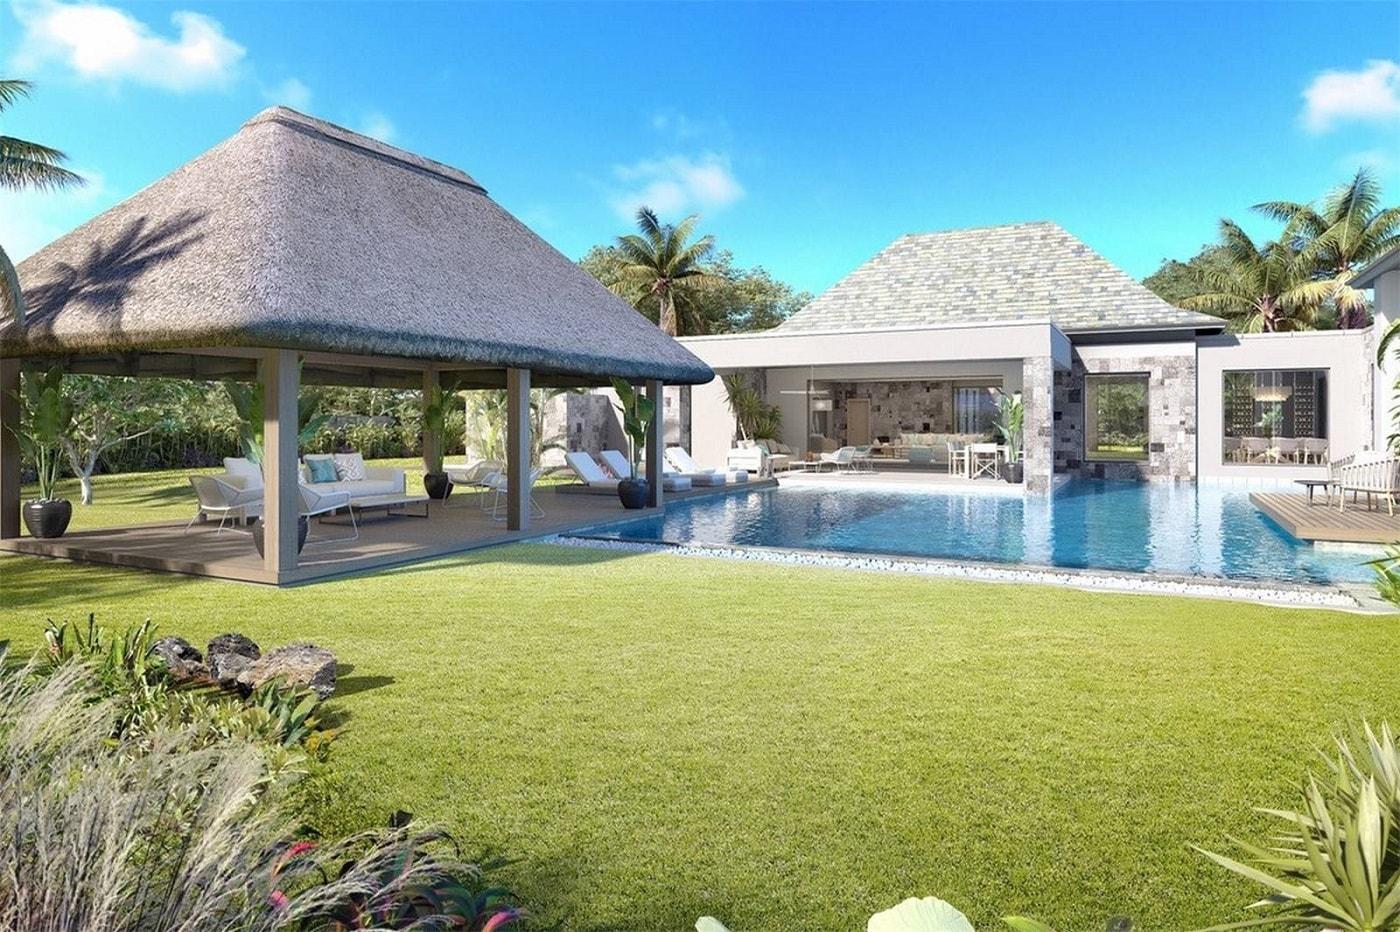 Villa Grand Baie - jardin et piscine - PLEION Private Services